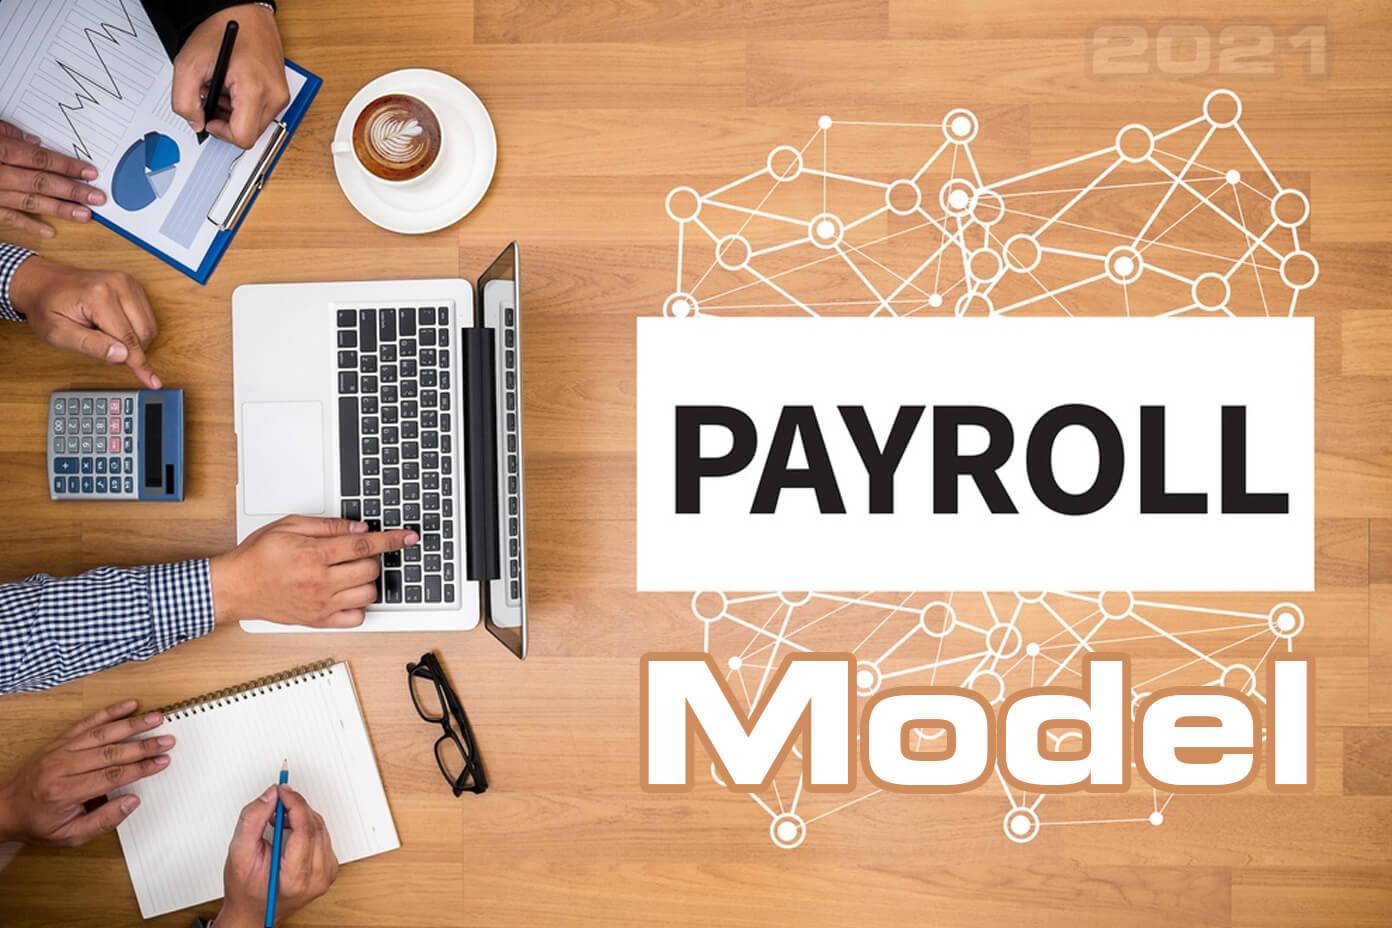 Payroll Technology Trends 2021